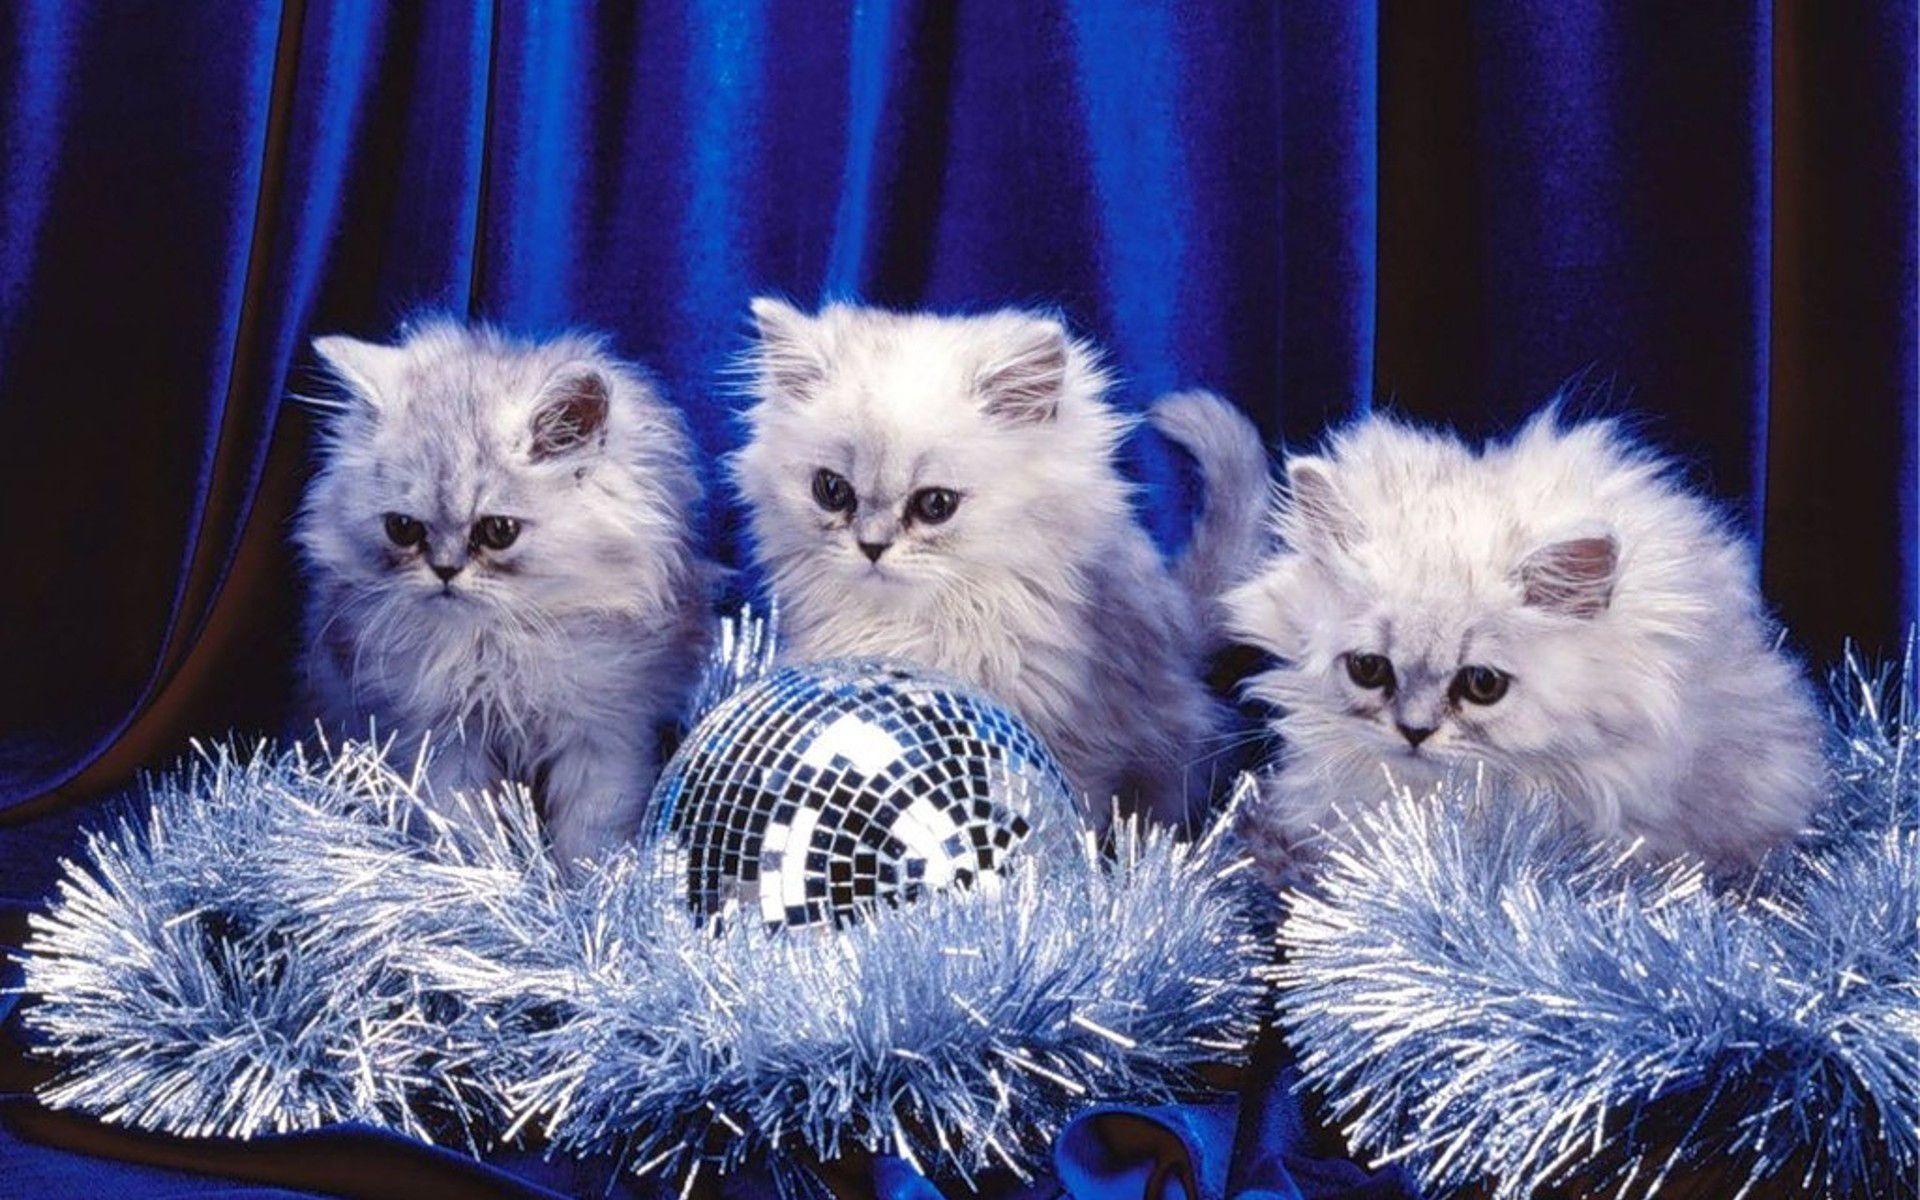 Free kittens wallpapers wallpaper cave - Free wallpaper of kittens ...